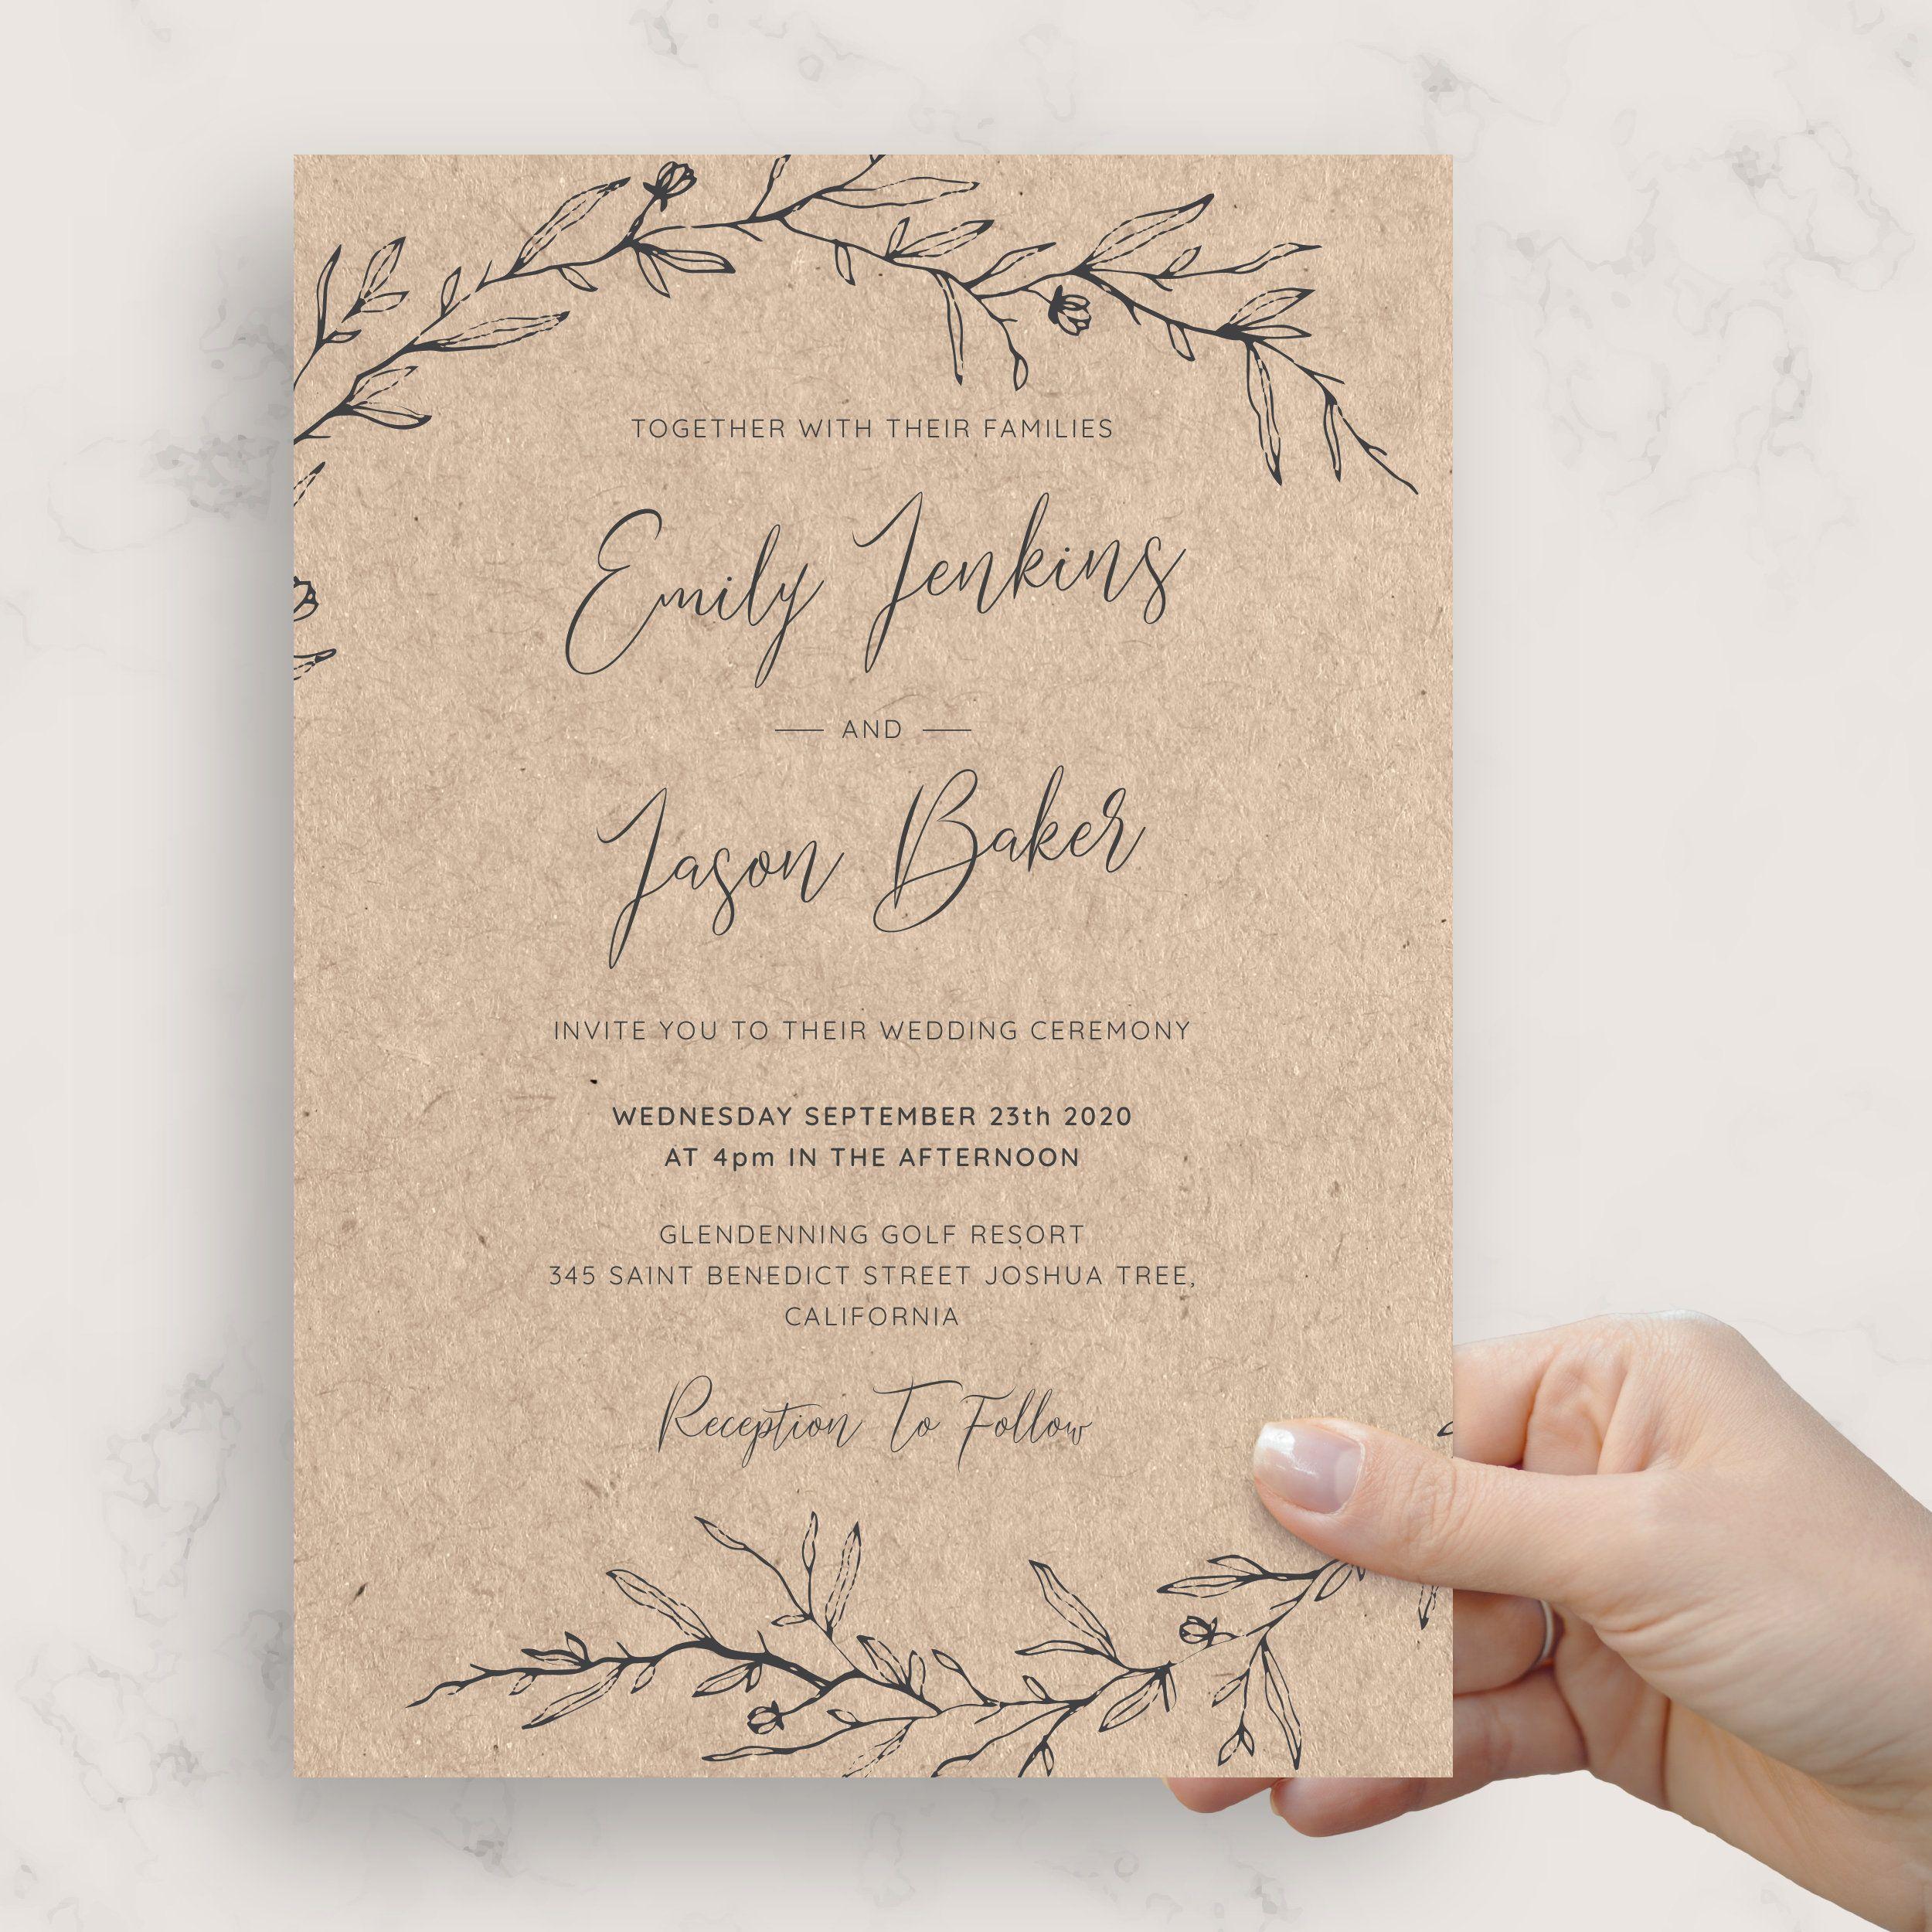 Vintage Wedding Invitation Templates Download Print In 2020 Wedding Invitations Rustic Wedding Invitations Diy Rustic Vintage Wedding Invitations Templates